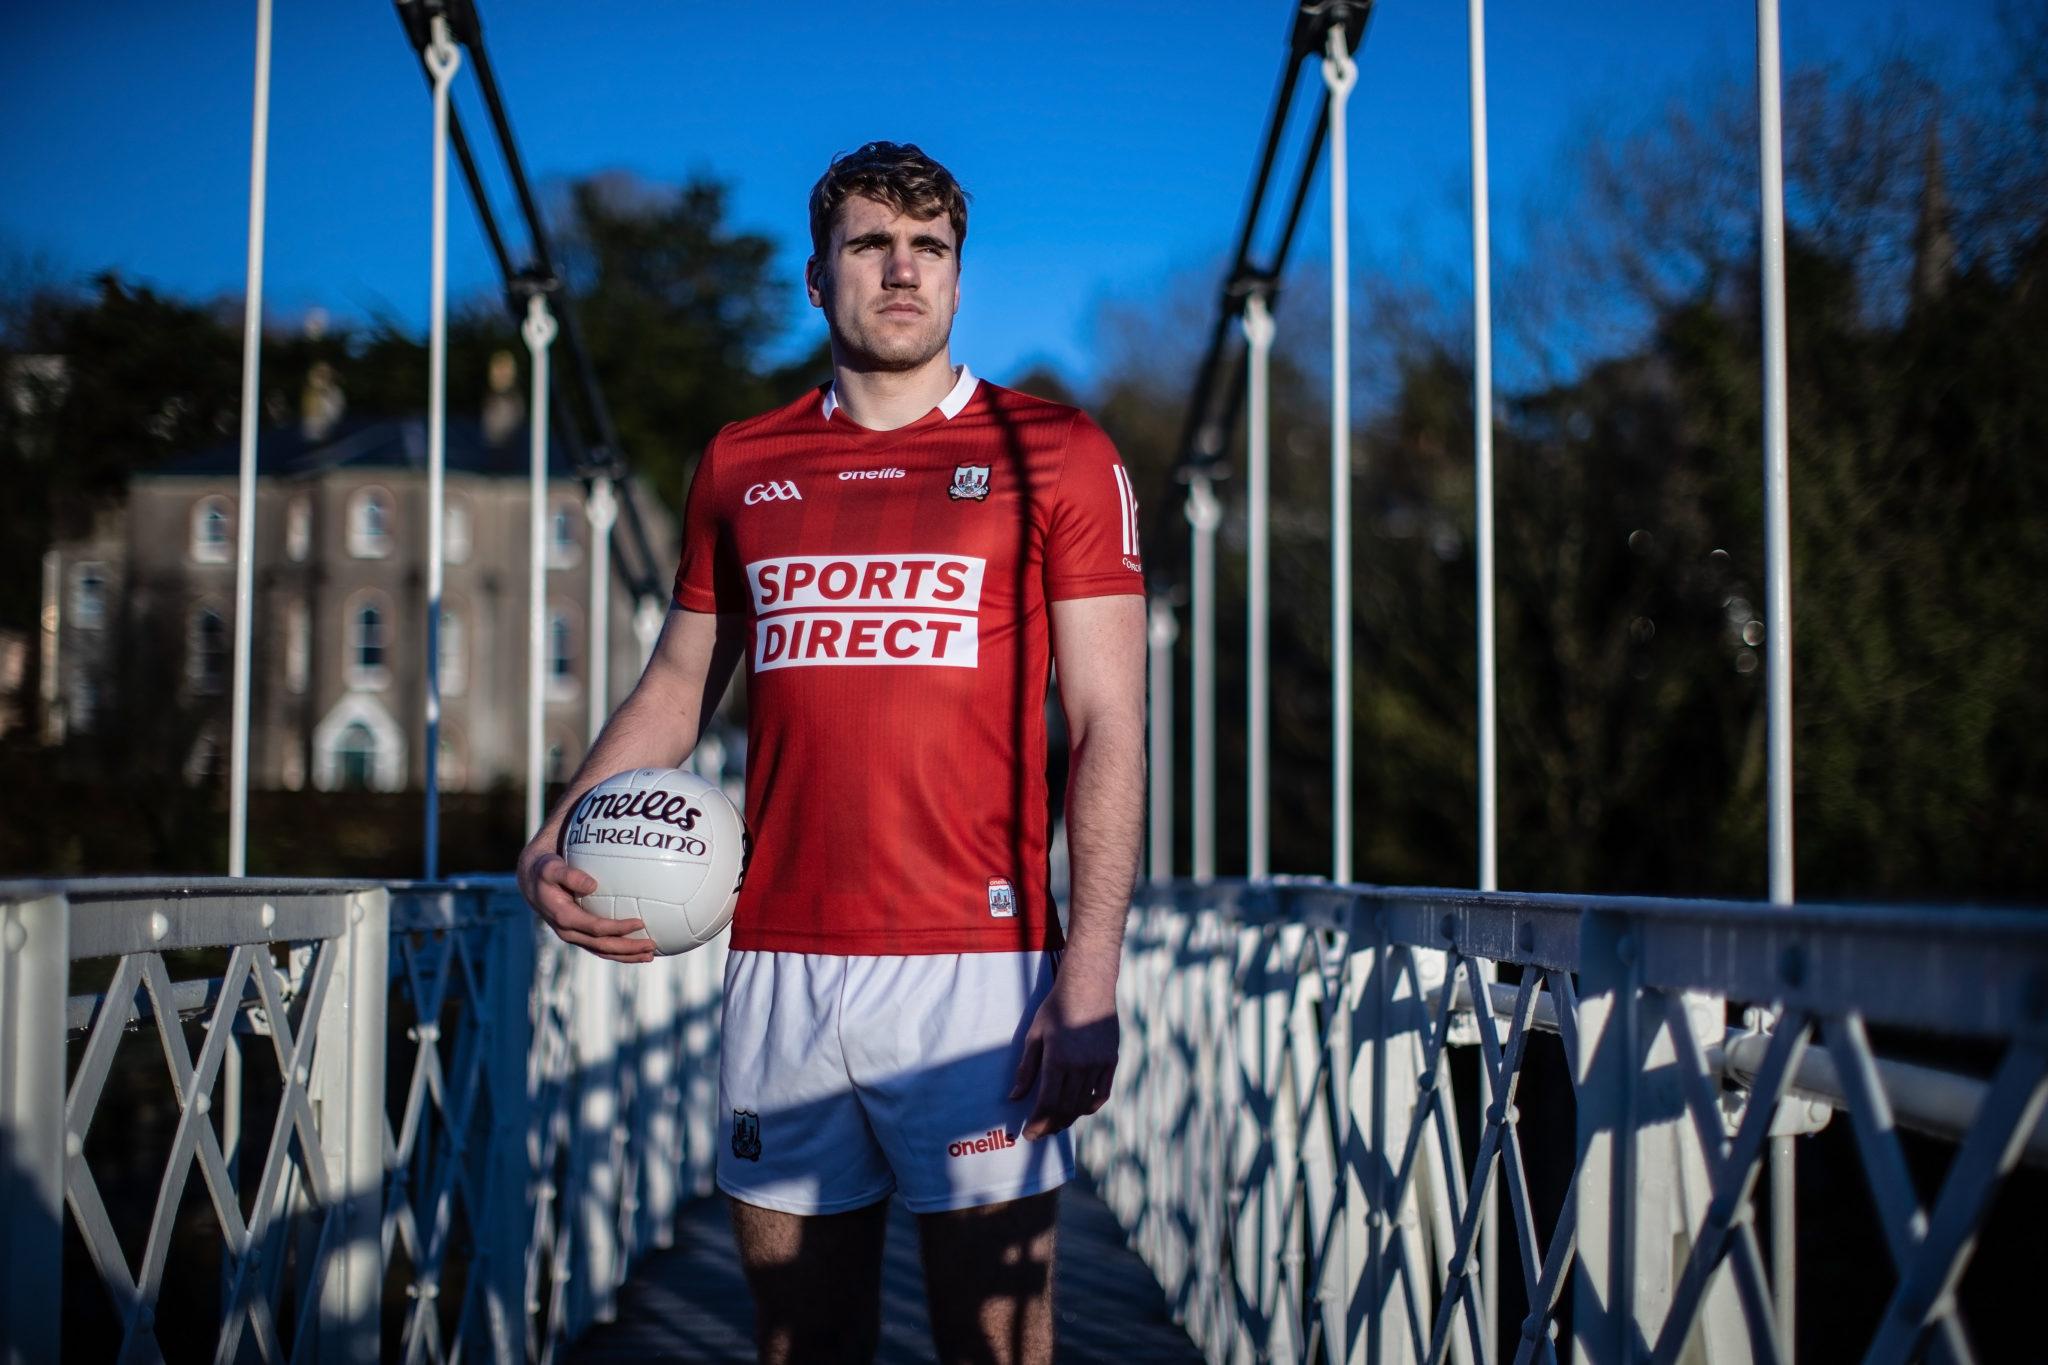 Cork jersey